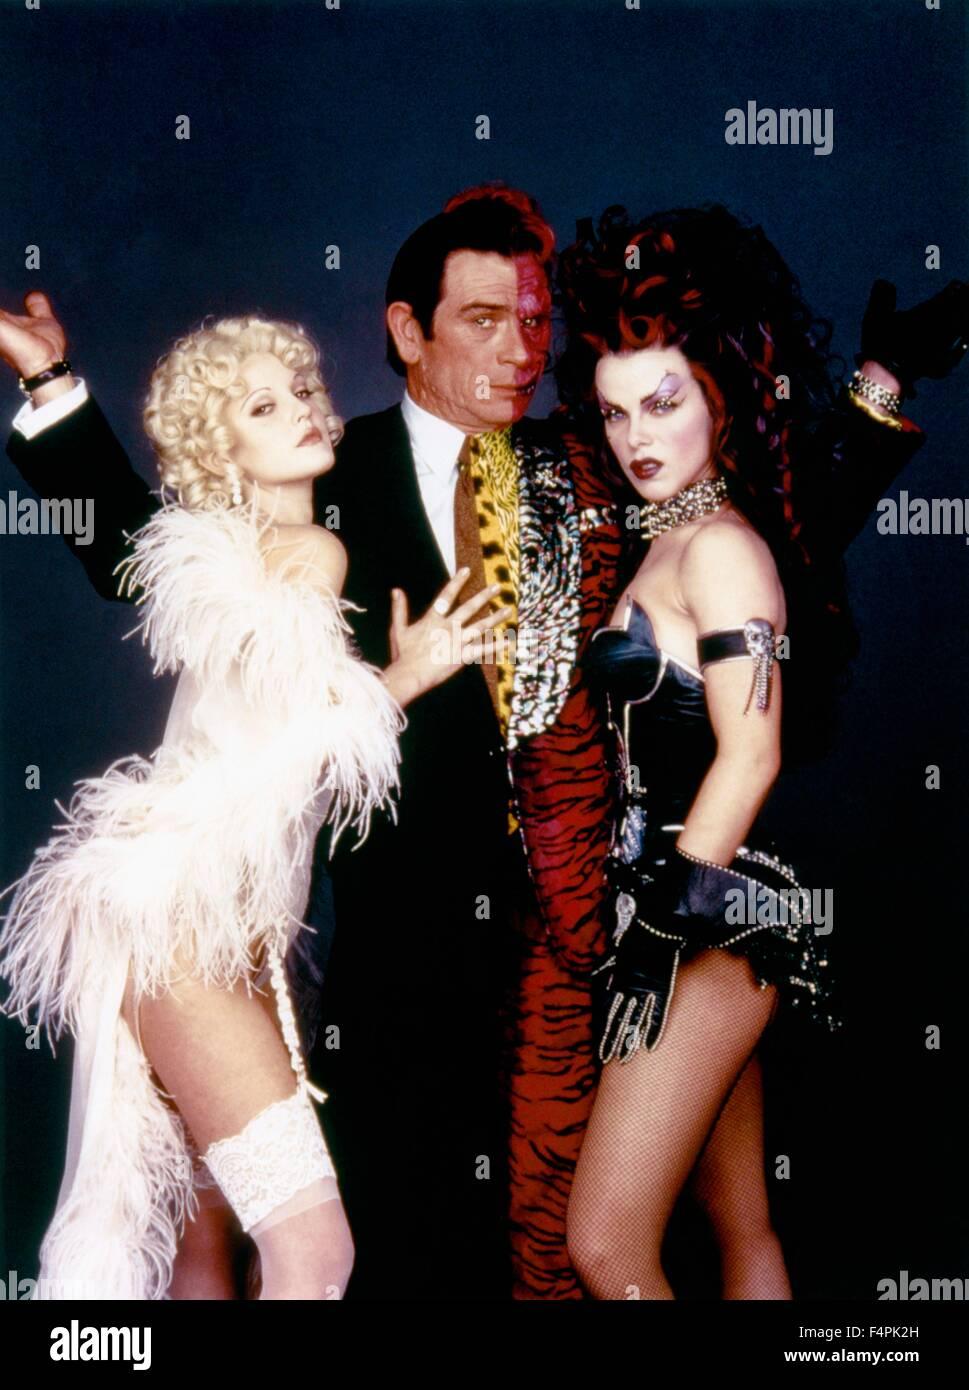 Drew barrymore tommy lee jones and debi mazar batman forever 1995 directed by